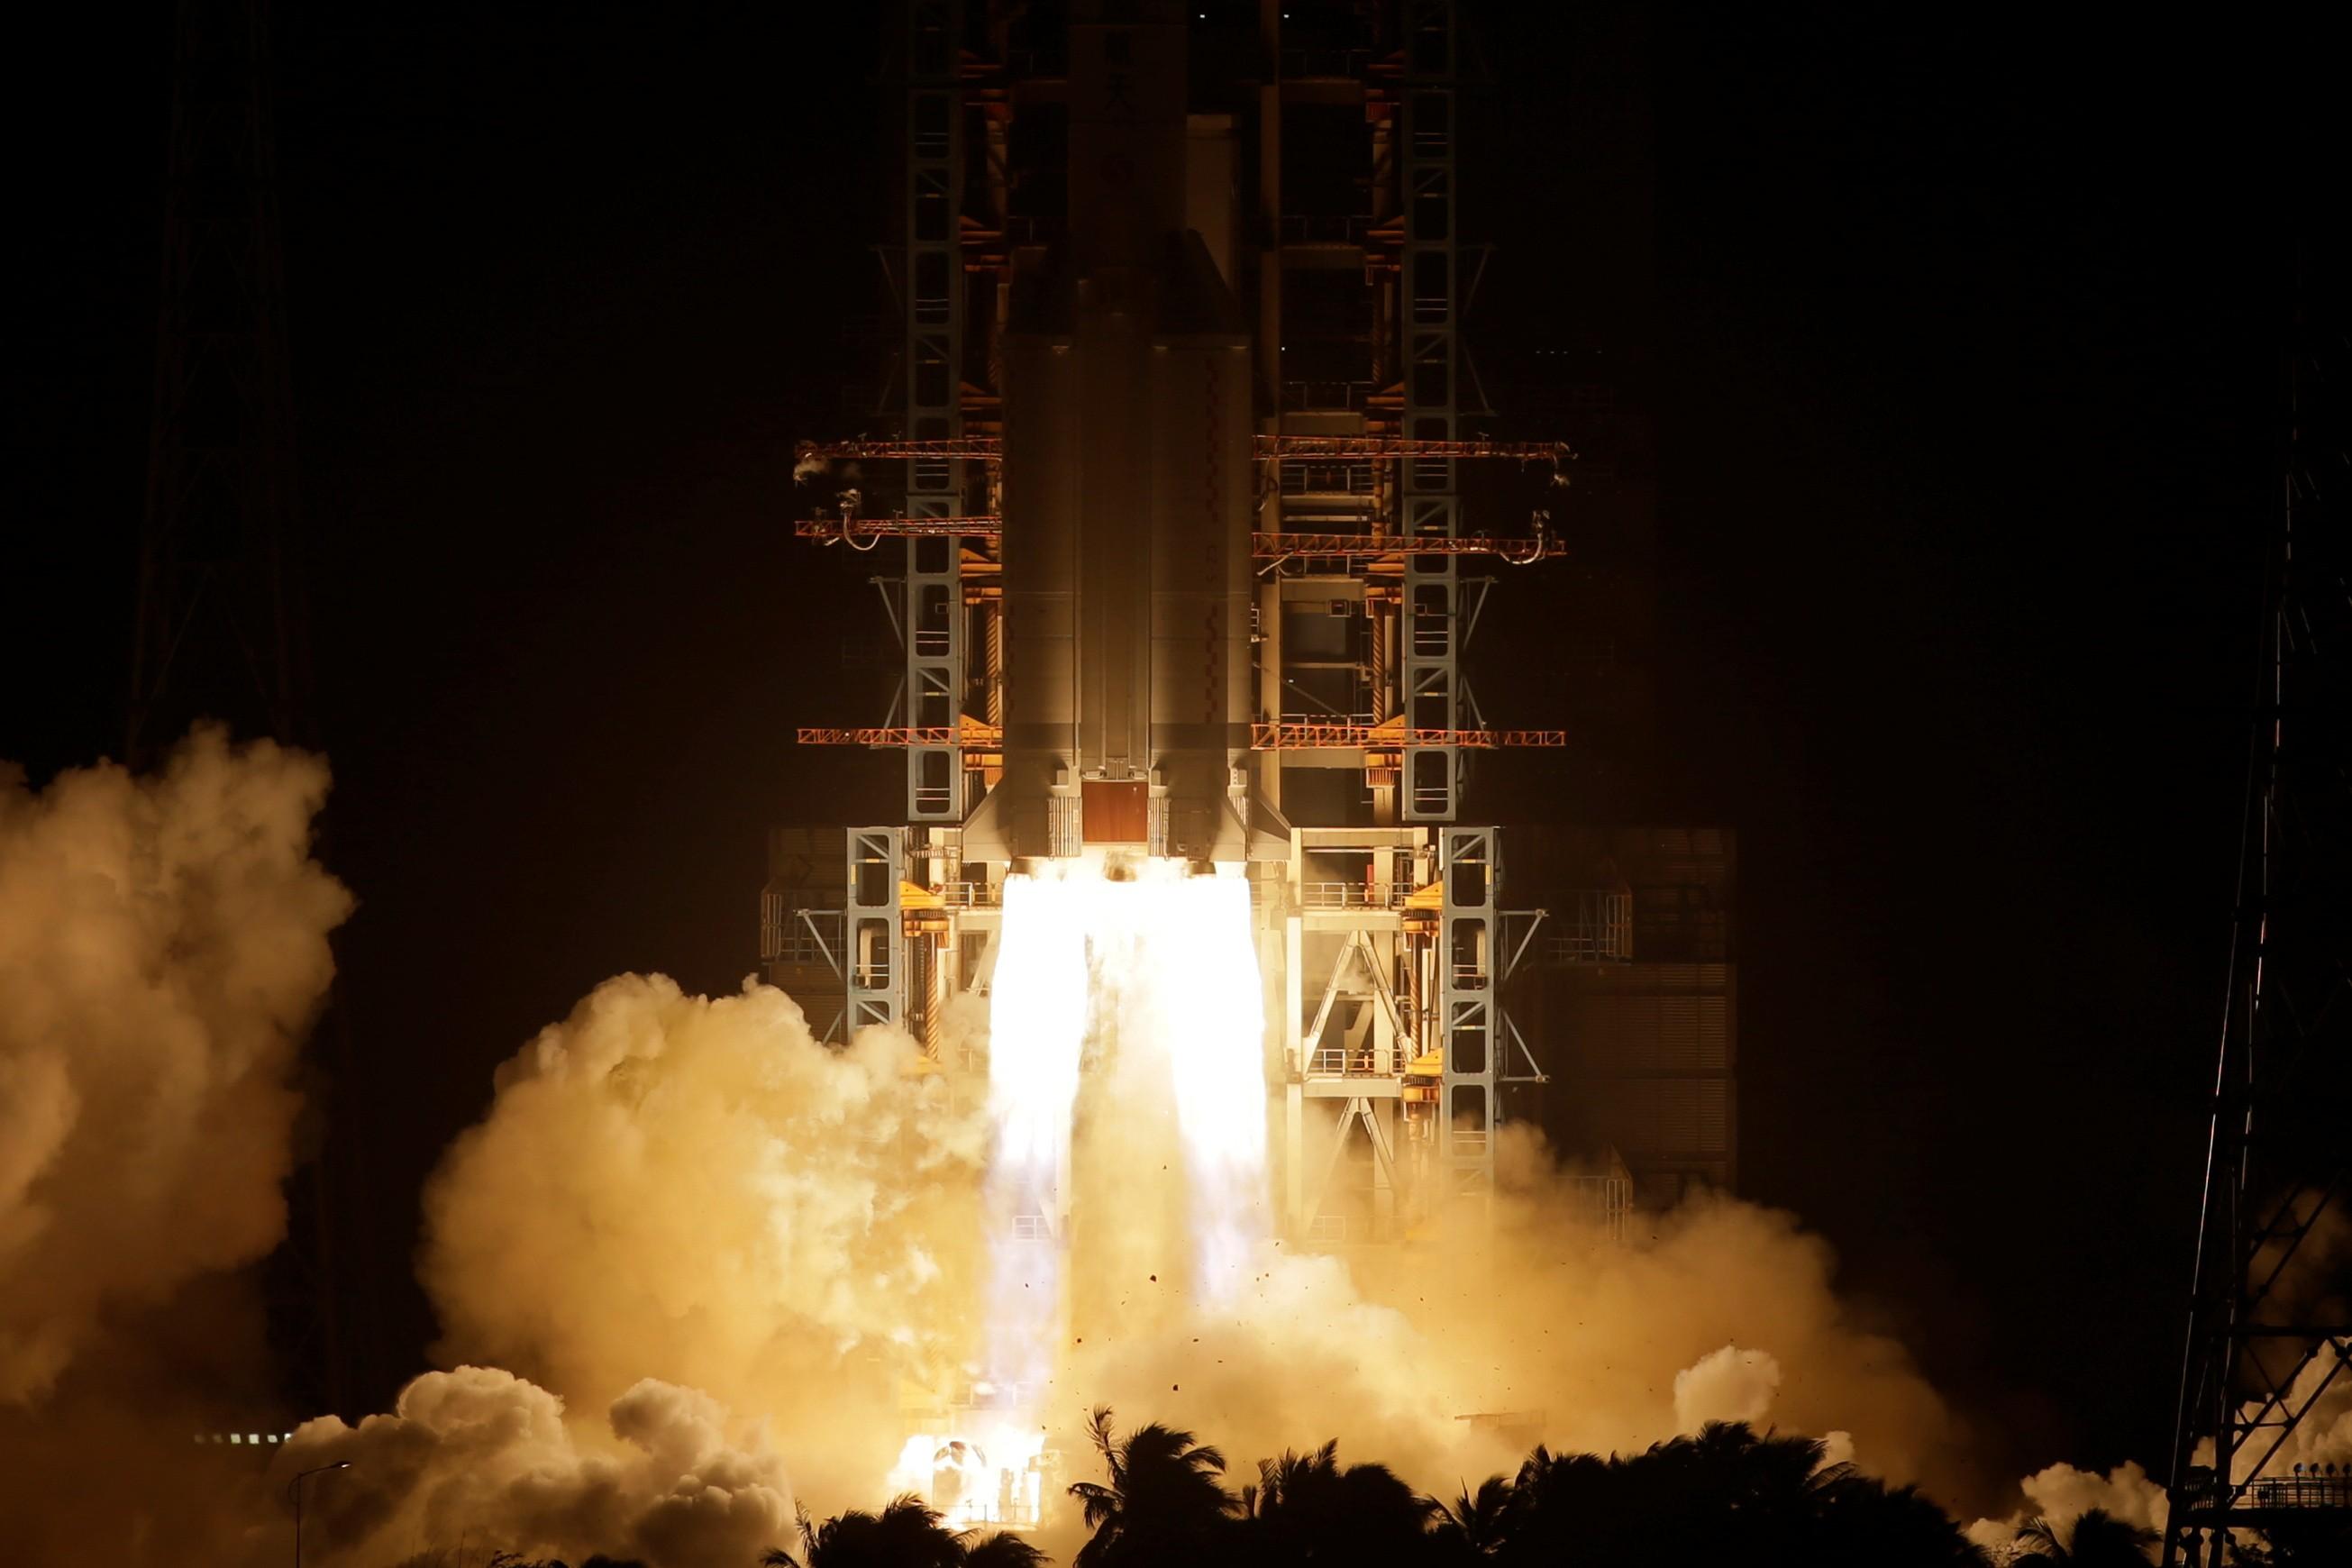 Nave chinesa pousa na Lua para coletar amostras lunares